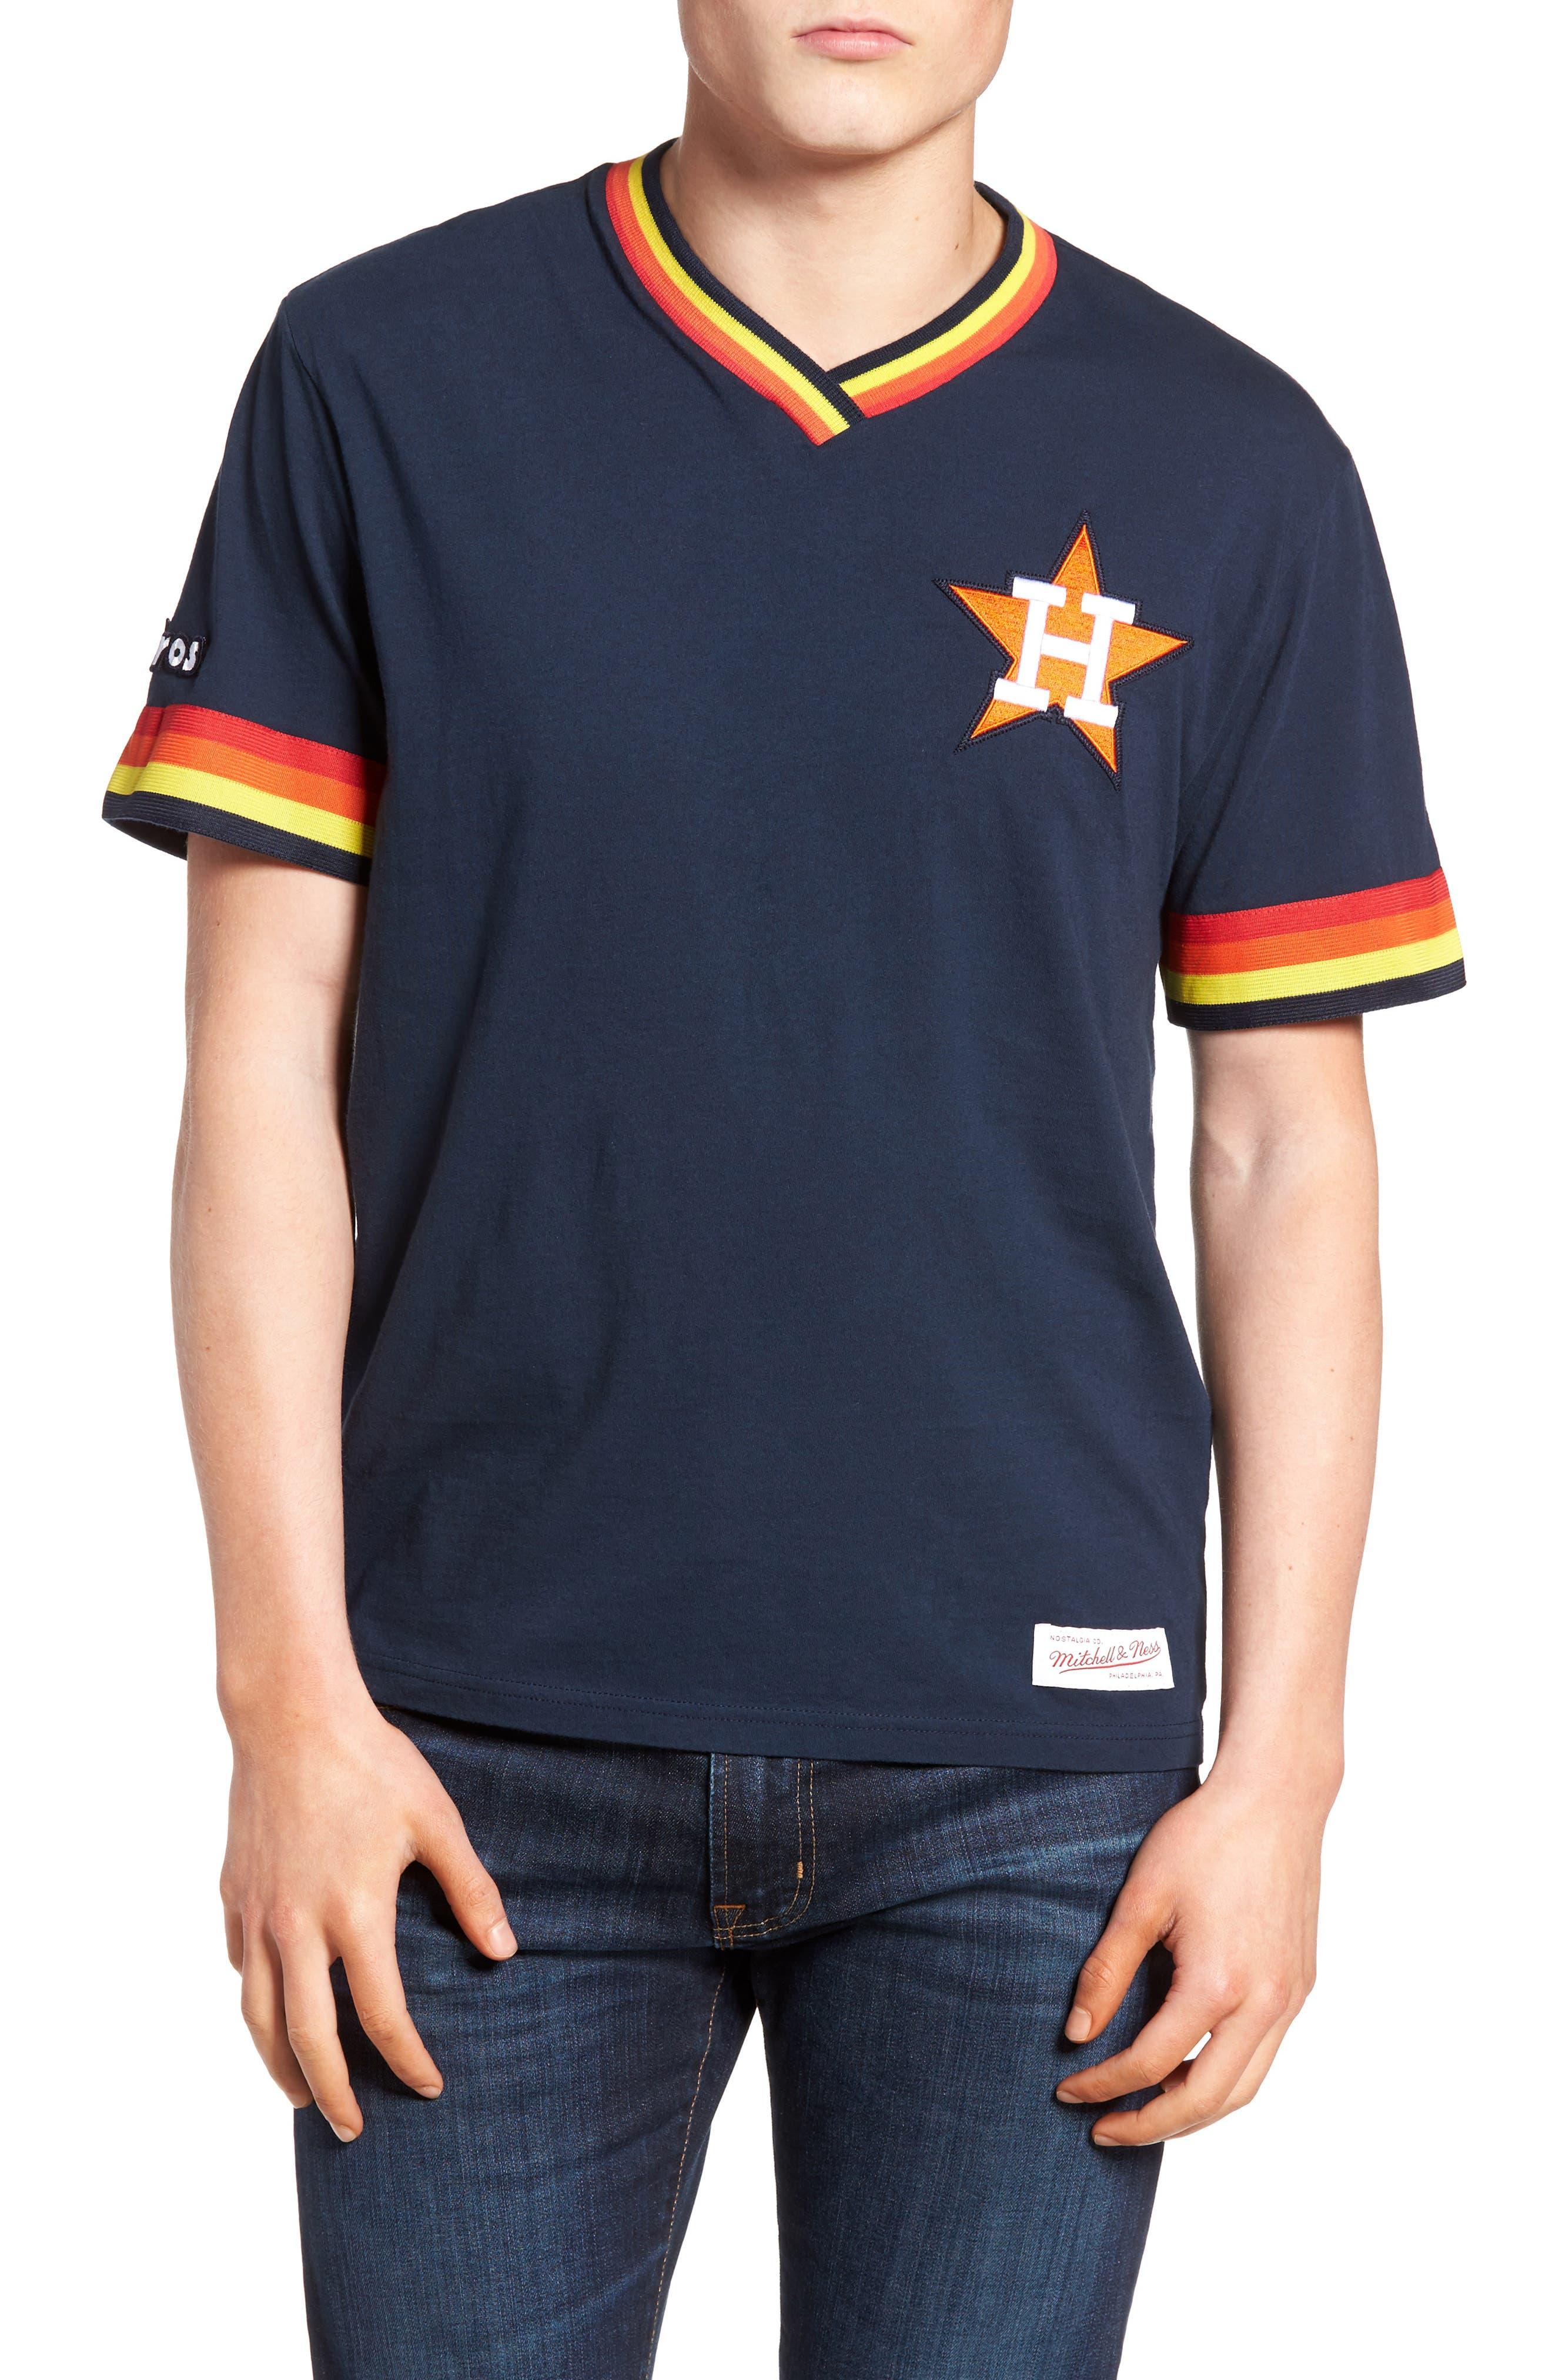 Switzerland Houston Astros Vintage Jersey 9e5f6 E4dfe